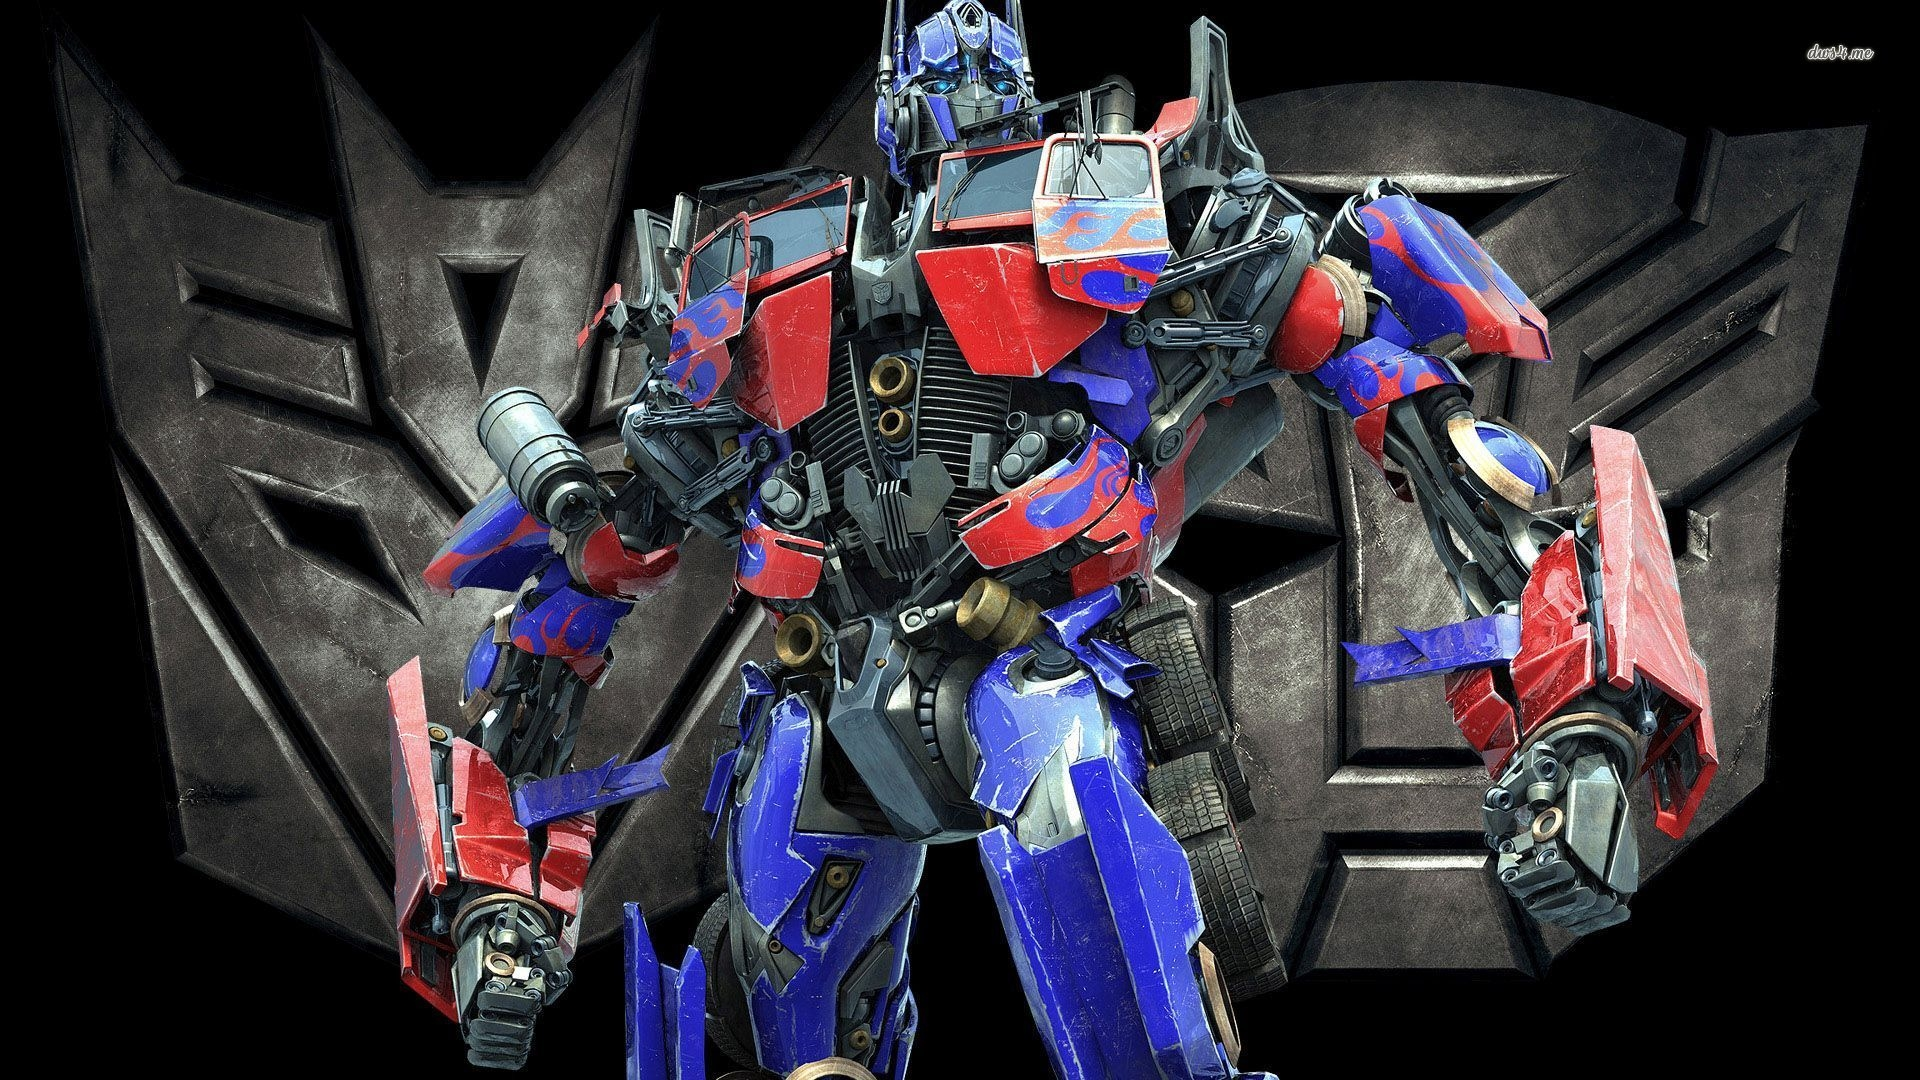 75 ] Optimus Prime Background On WallpaperSafari